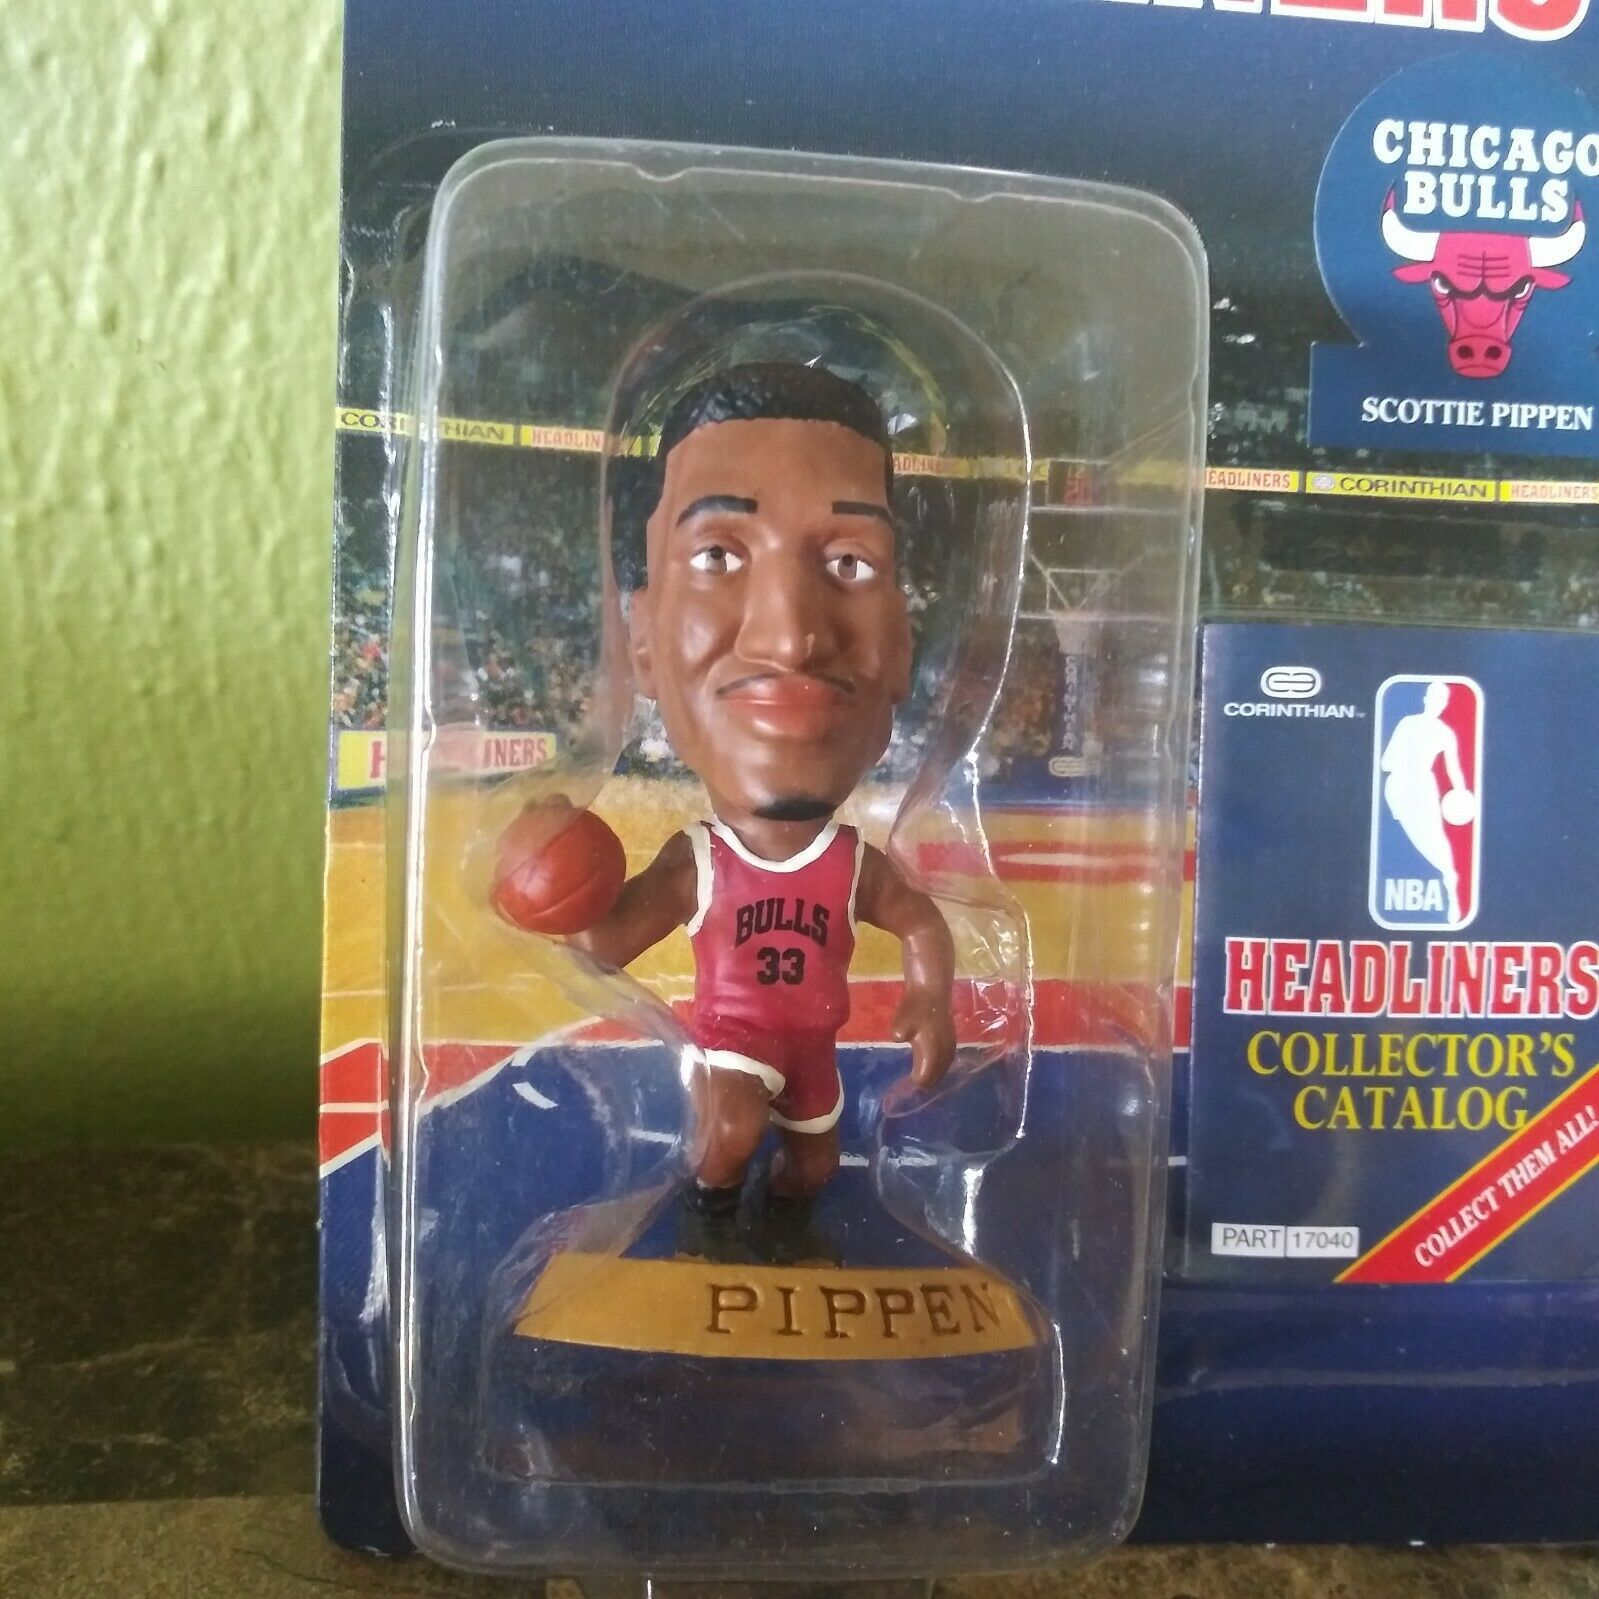 1997 Dennis Rodman Chicago Bulls Gold Hair Corinthian Headliners mint on card